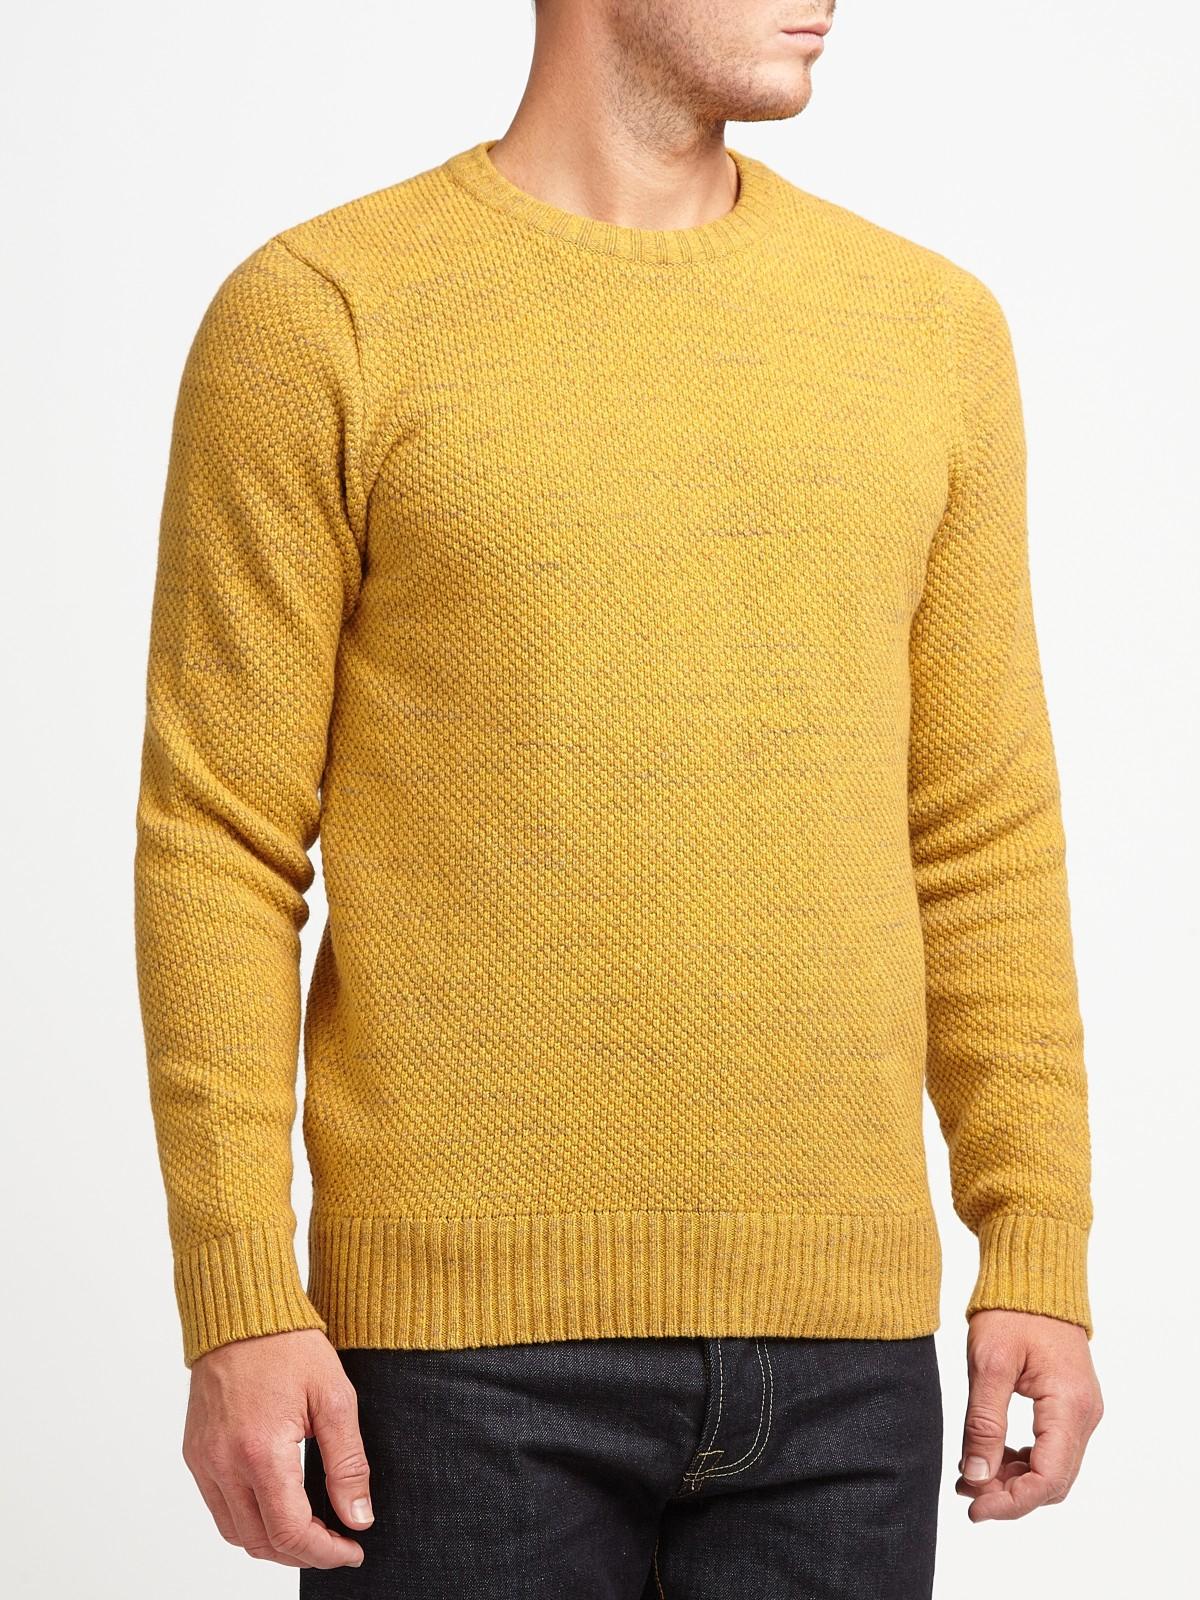 John Lewis Cotton Moss Stitch Crew Neck Jumper in Gold (Metallic) for Men